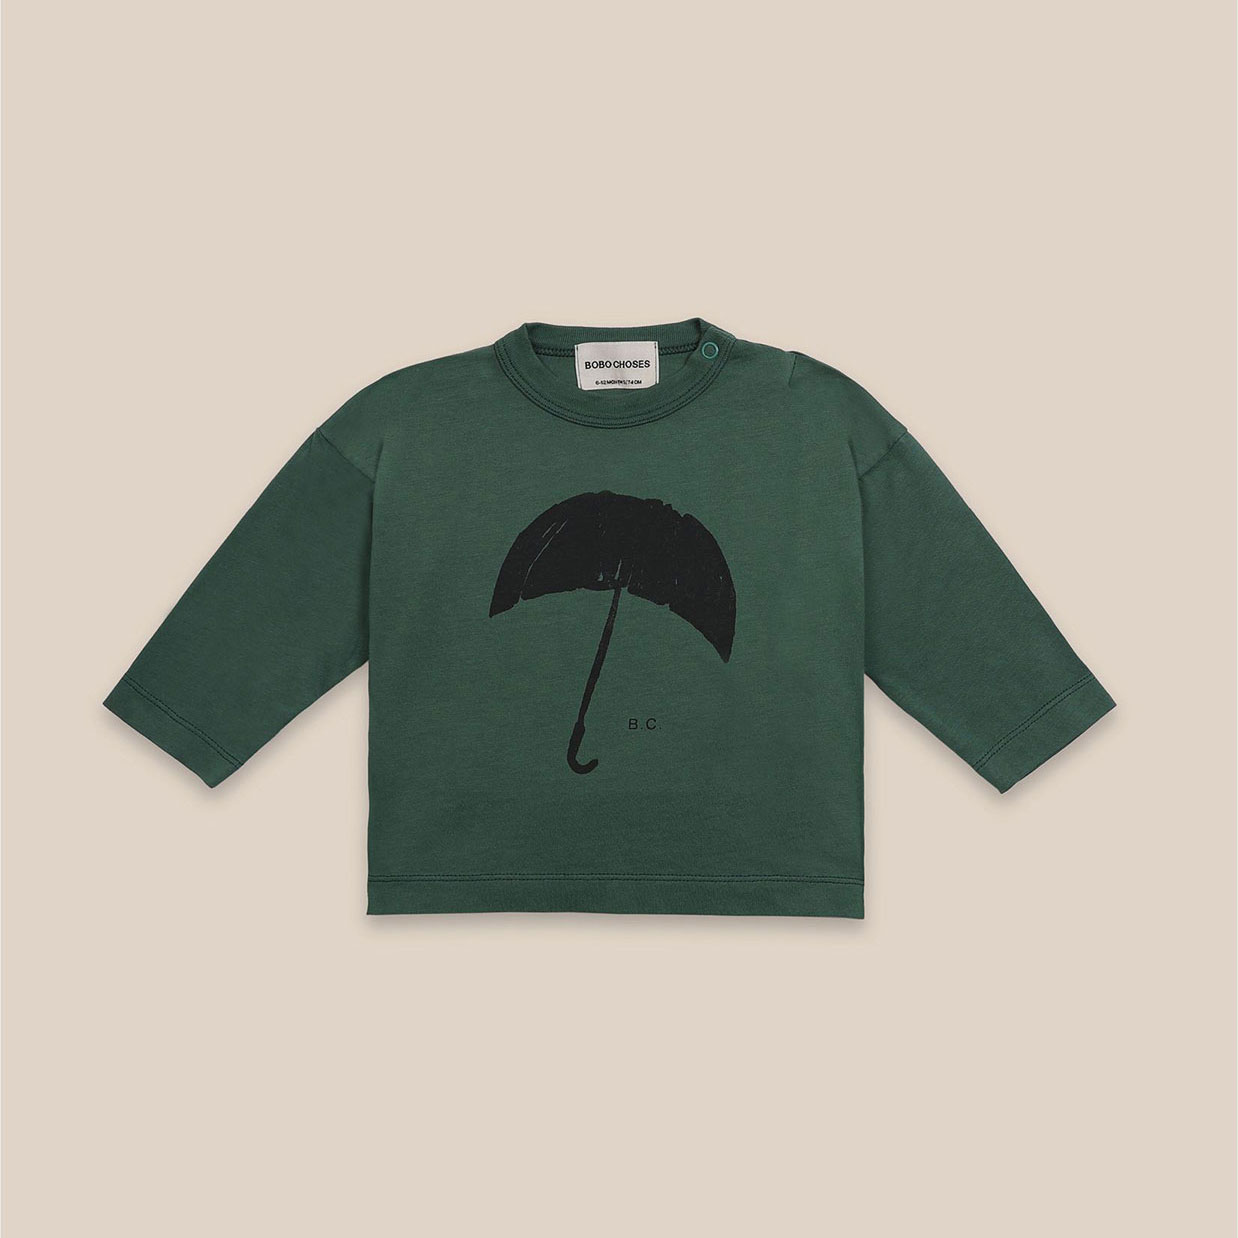 Bobo Choses - Baby Umbrella Long Sleeve T-Shirt